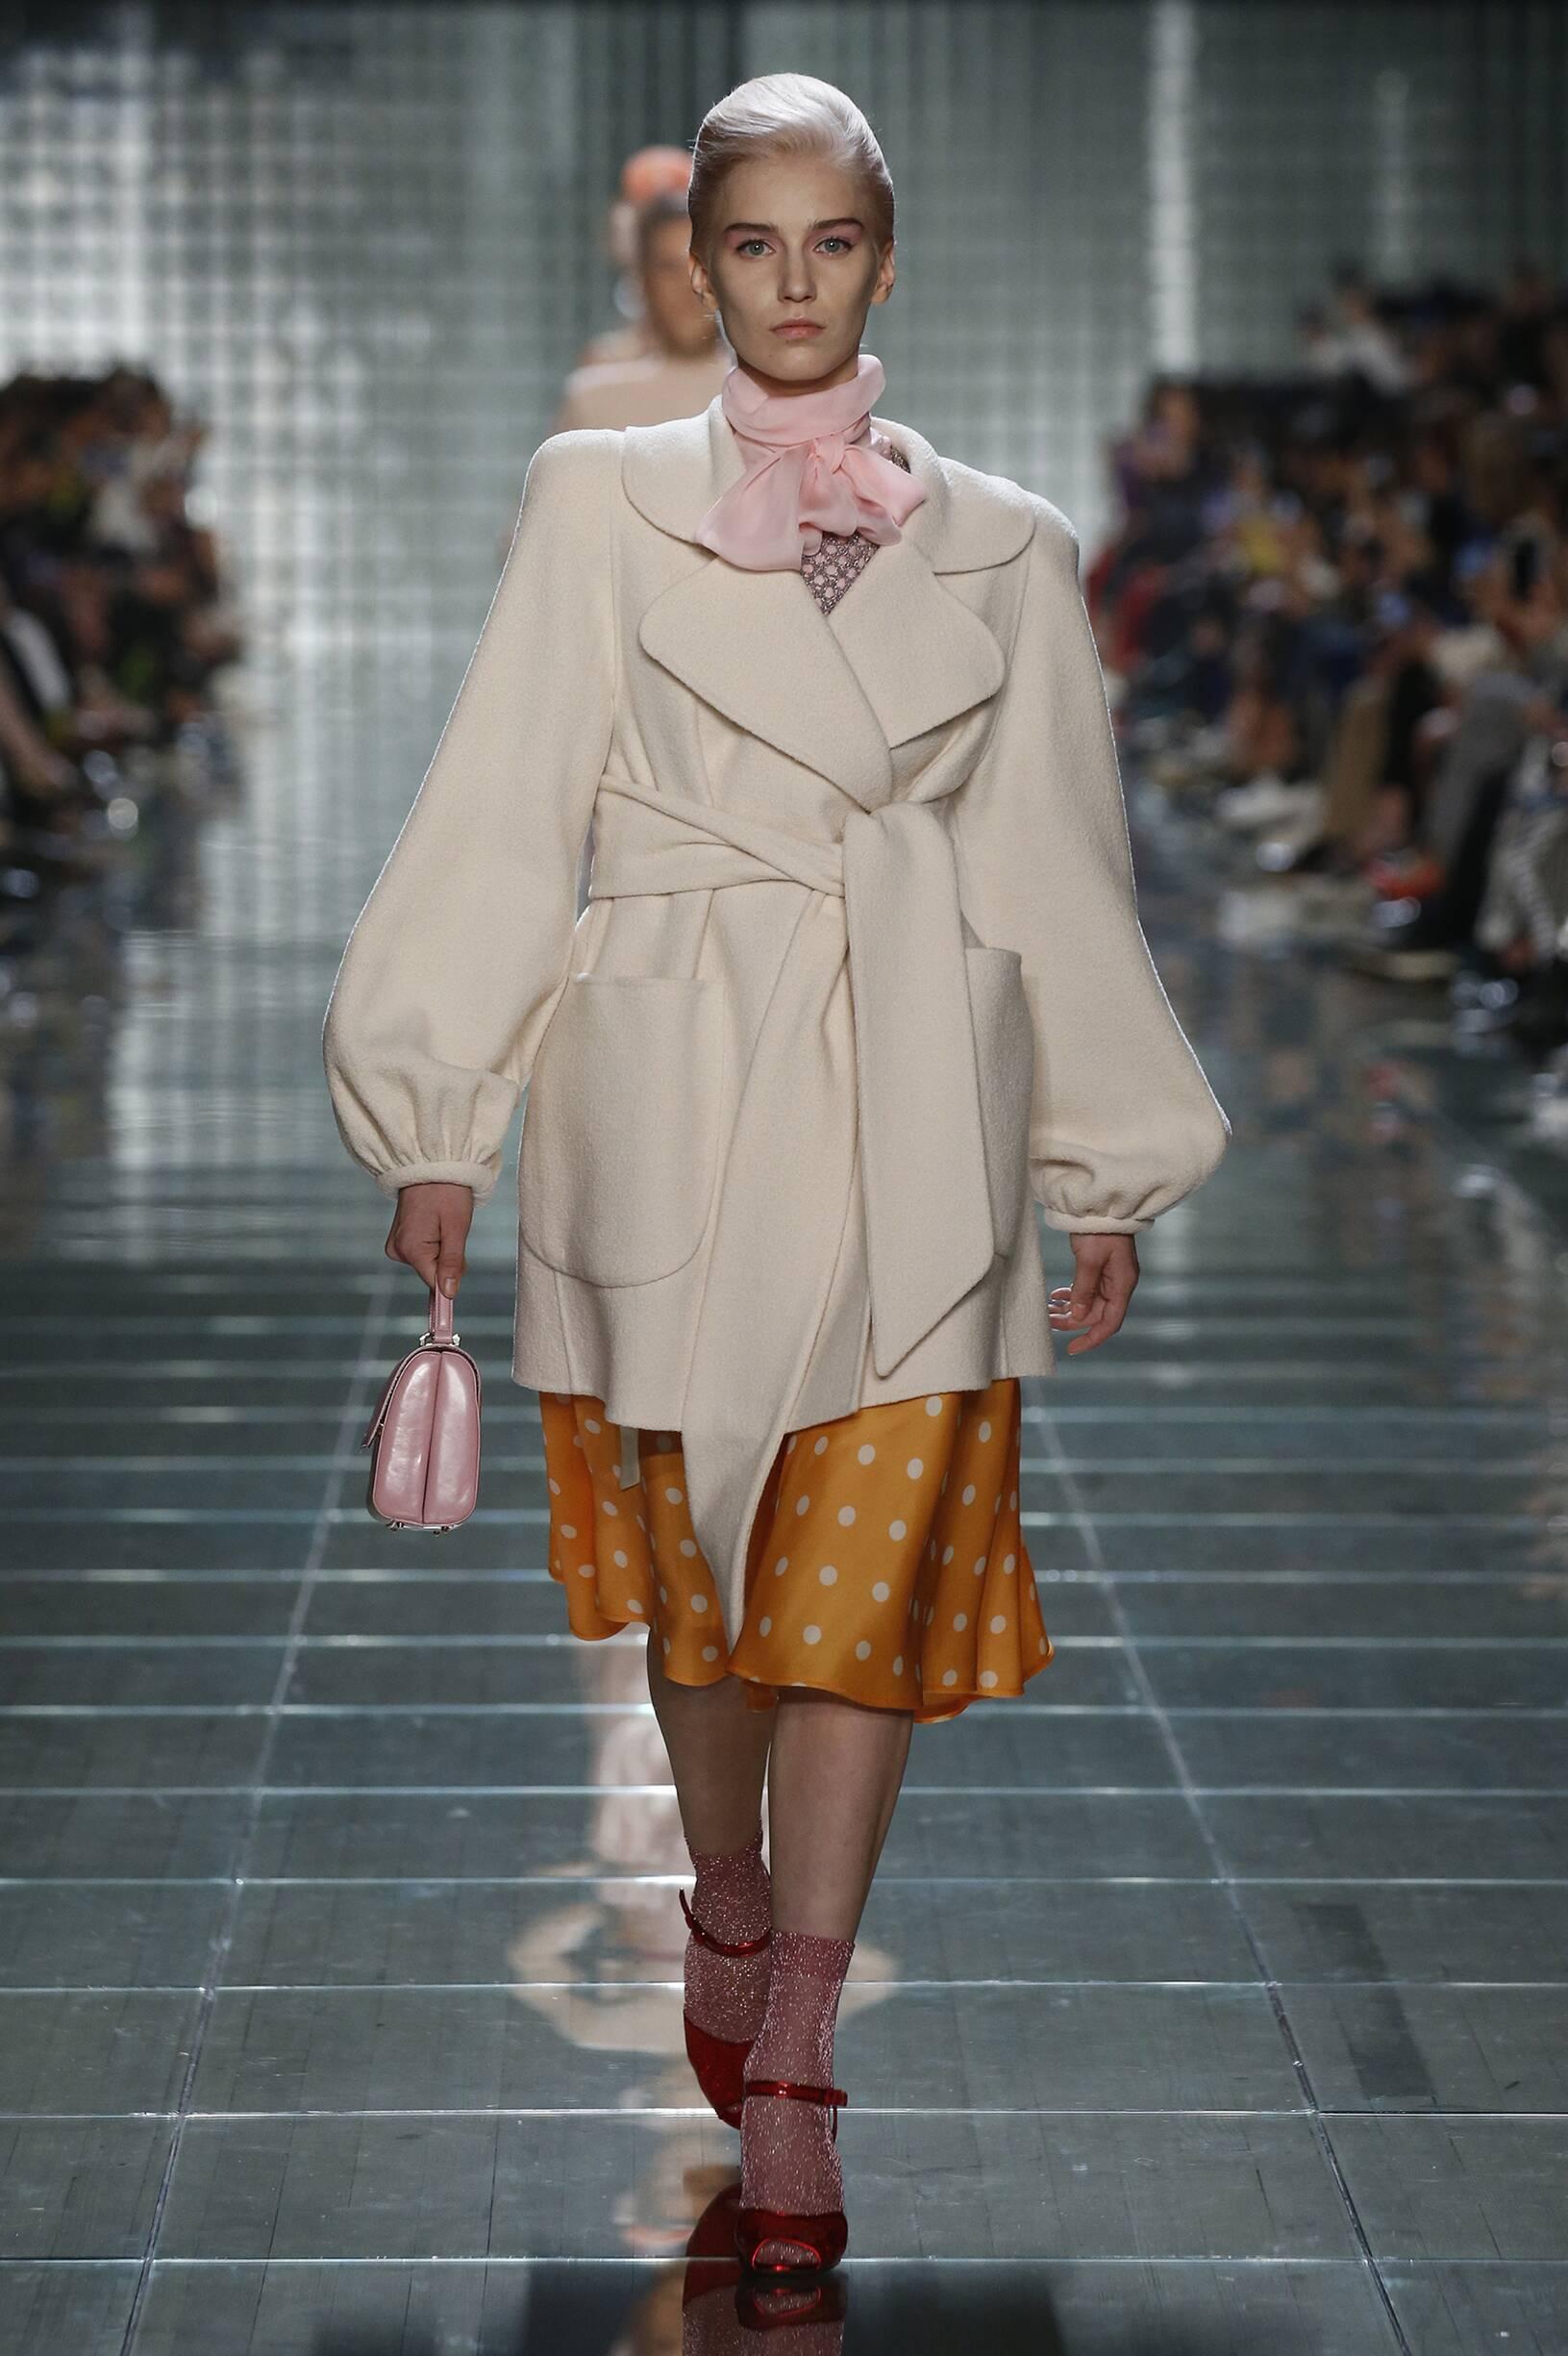 Fashion Woman Model Marc Jacobs Catwalk